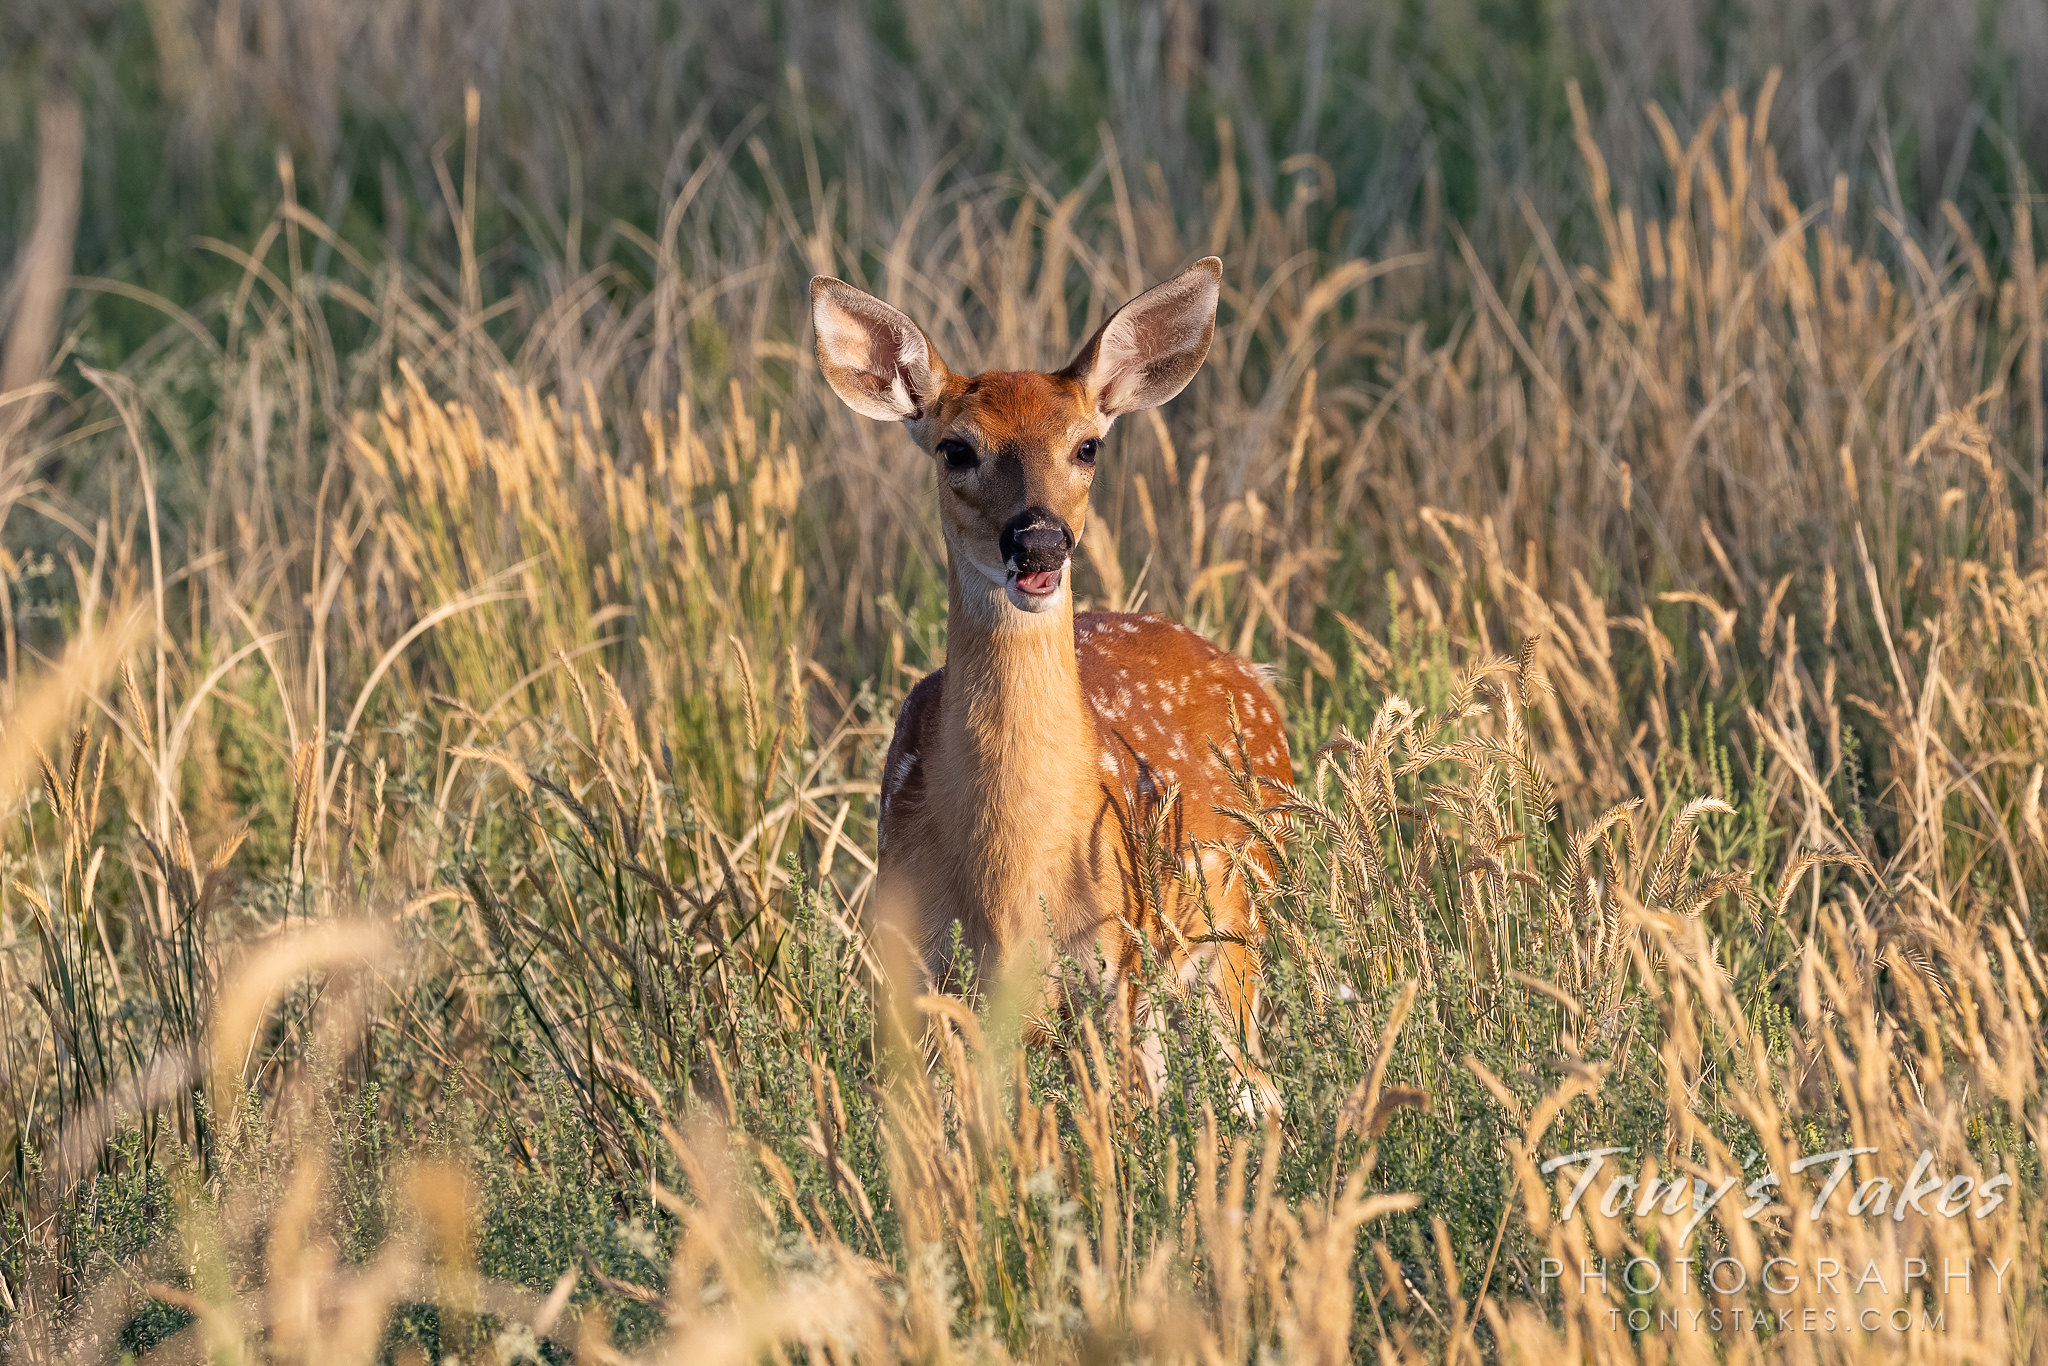 Bambi gives a big smile